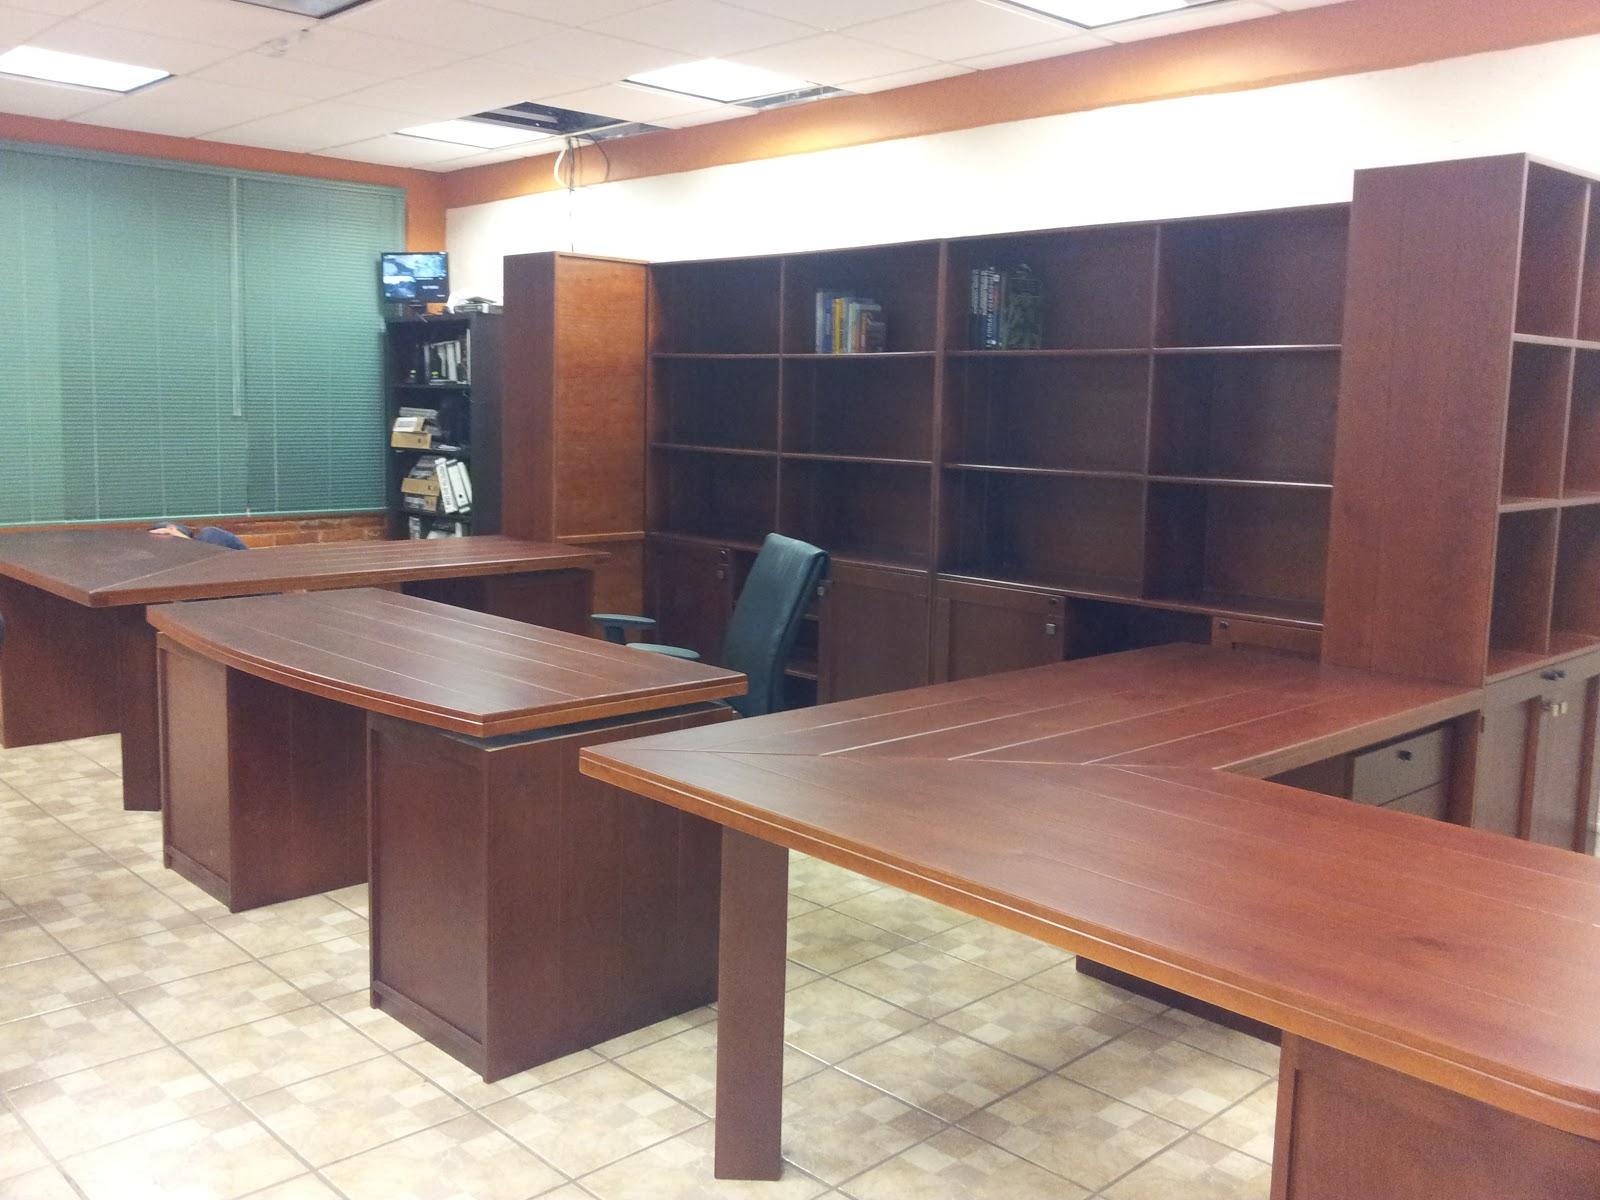 Muebles Vanguardistas Novedosos # Muebles Novedosos